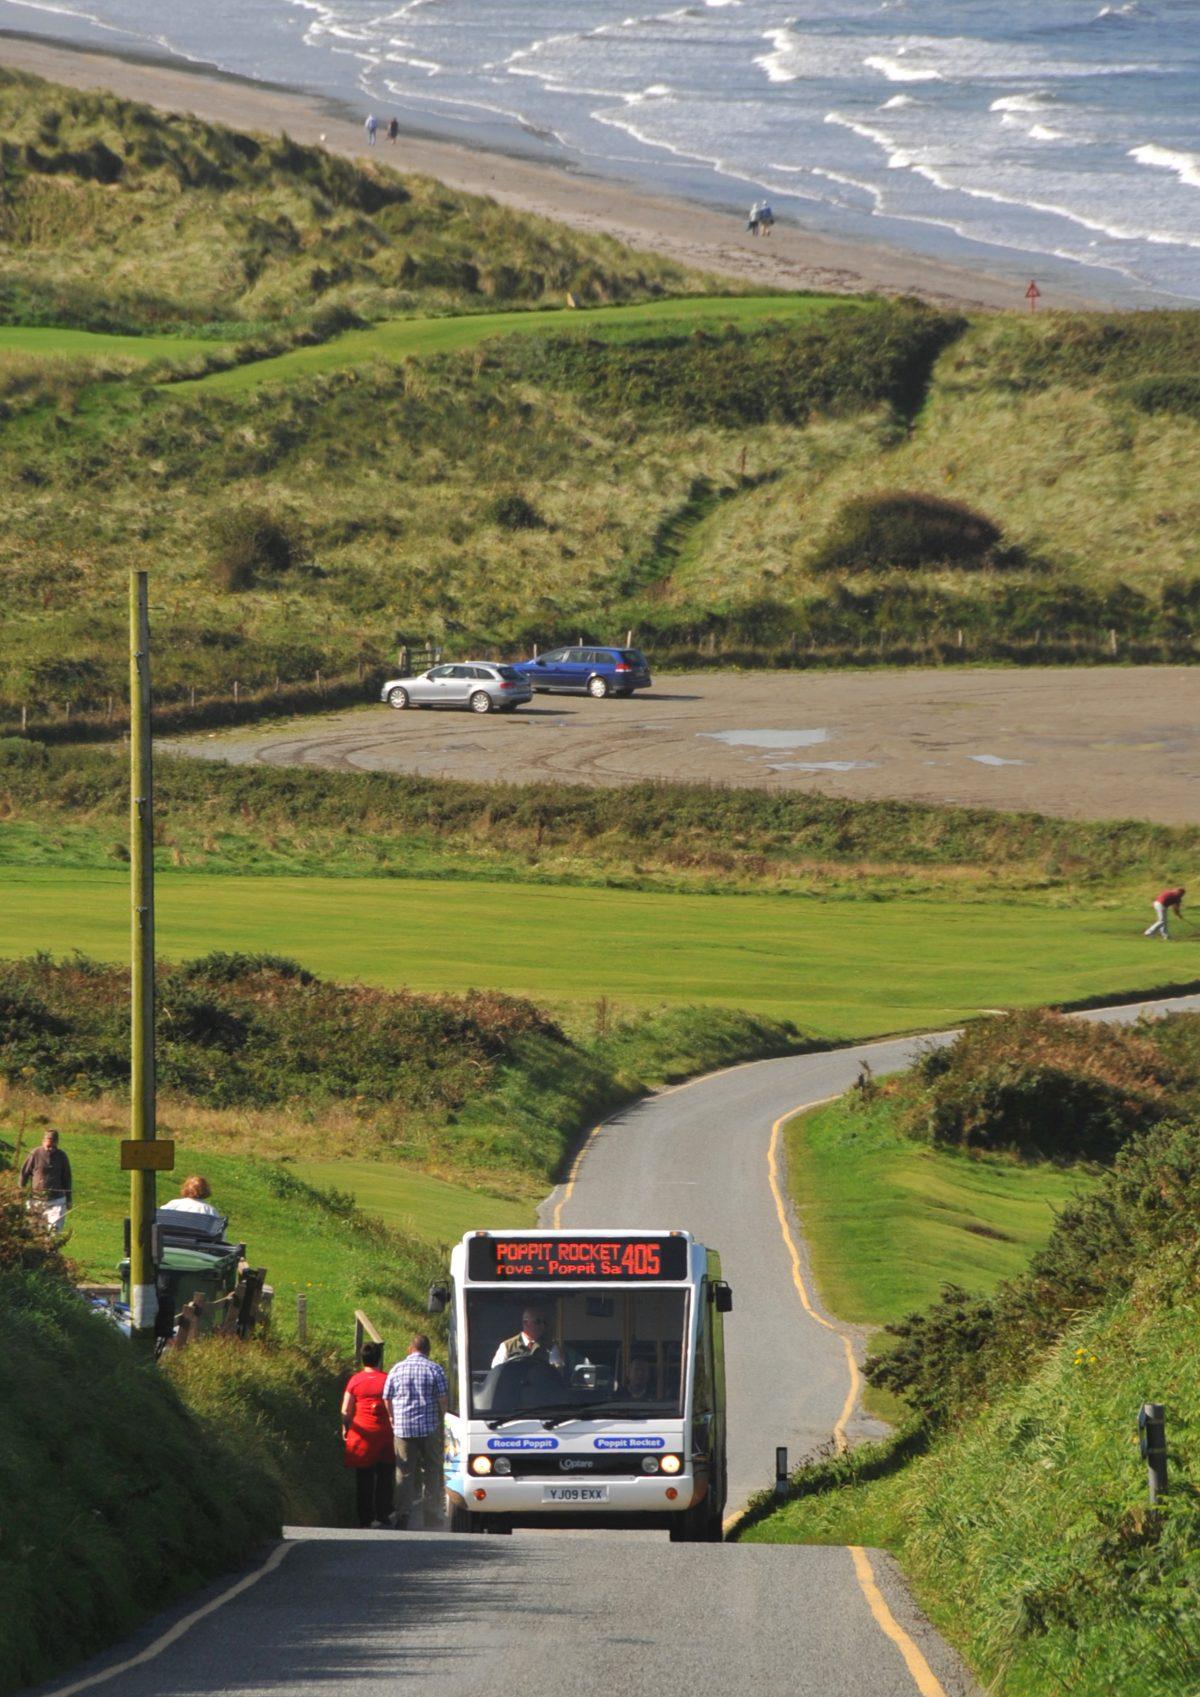 Bus picking up passengers on a narrow coastal road